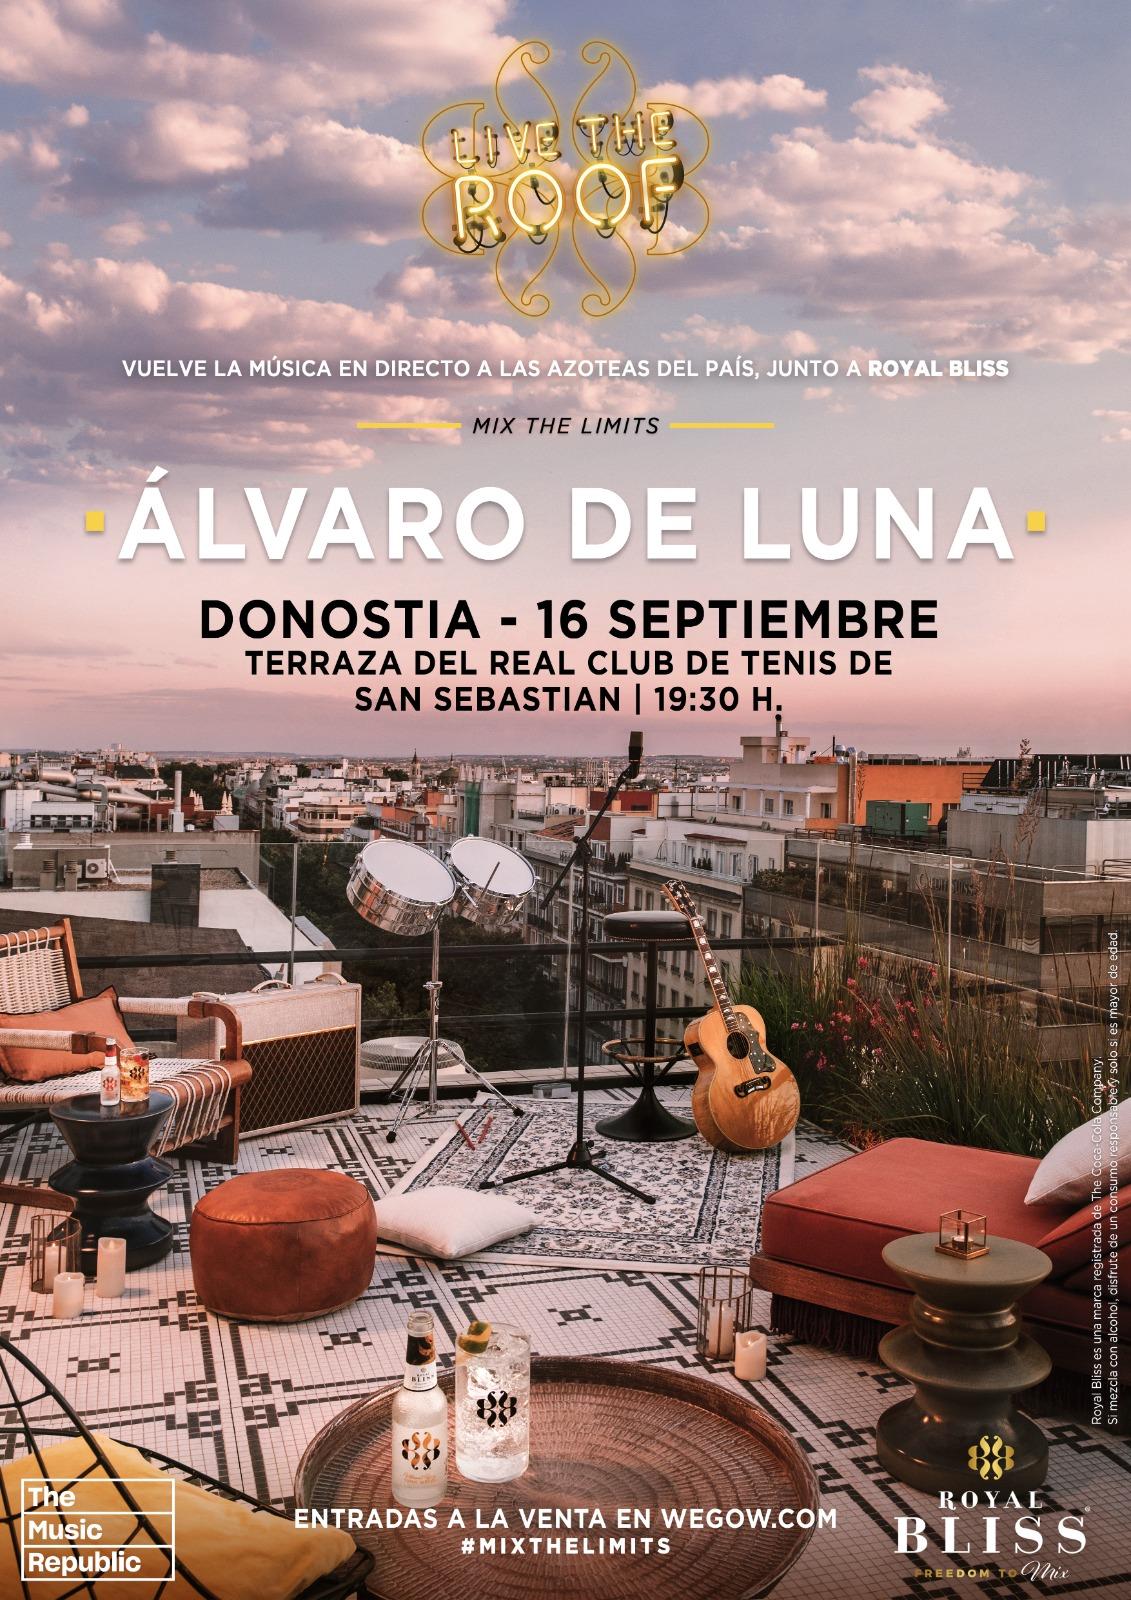 alvaro de luna en live the roof donostia 16238378048869505